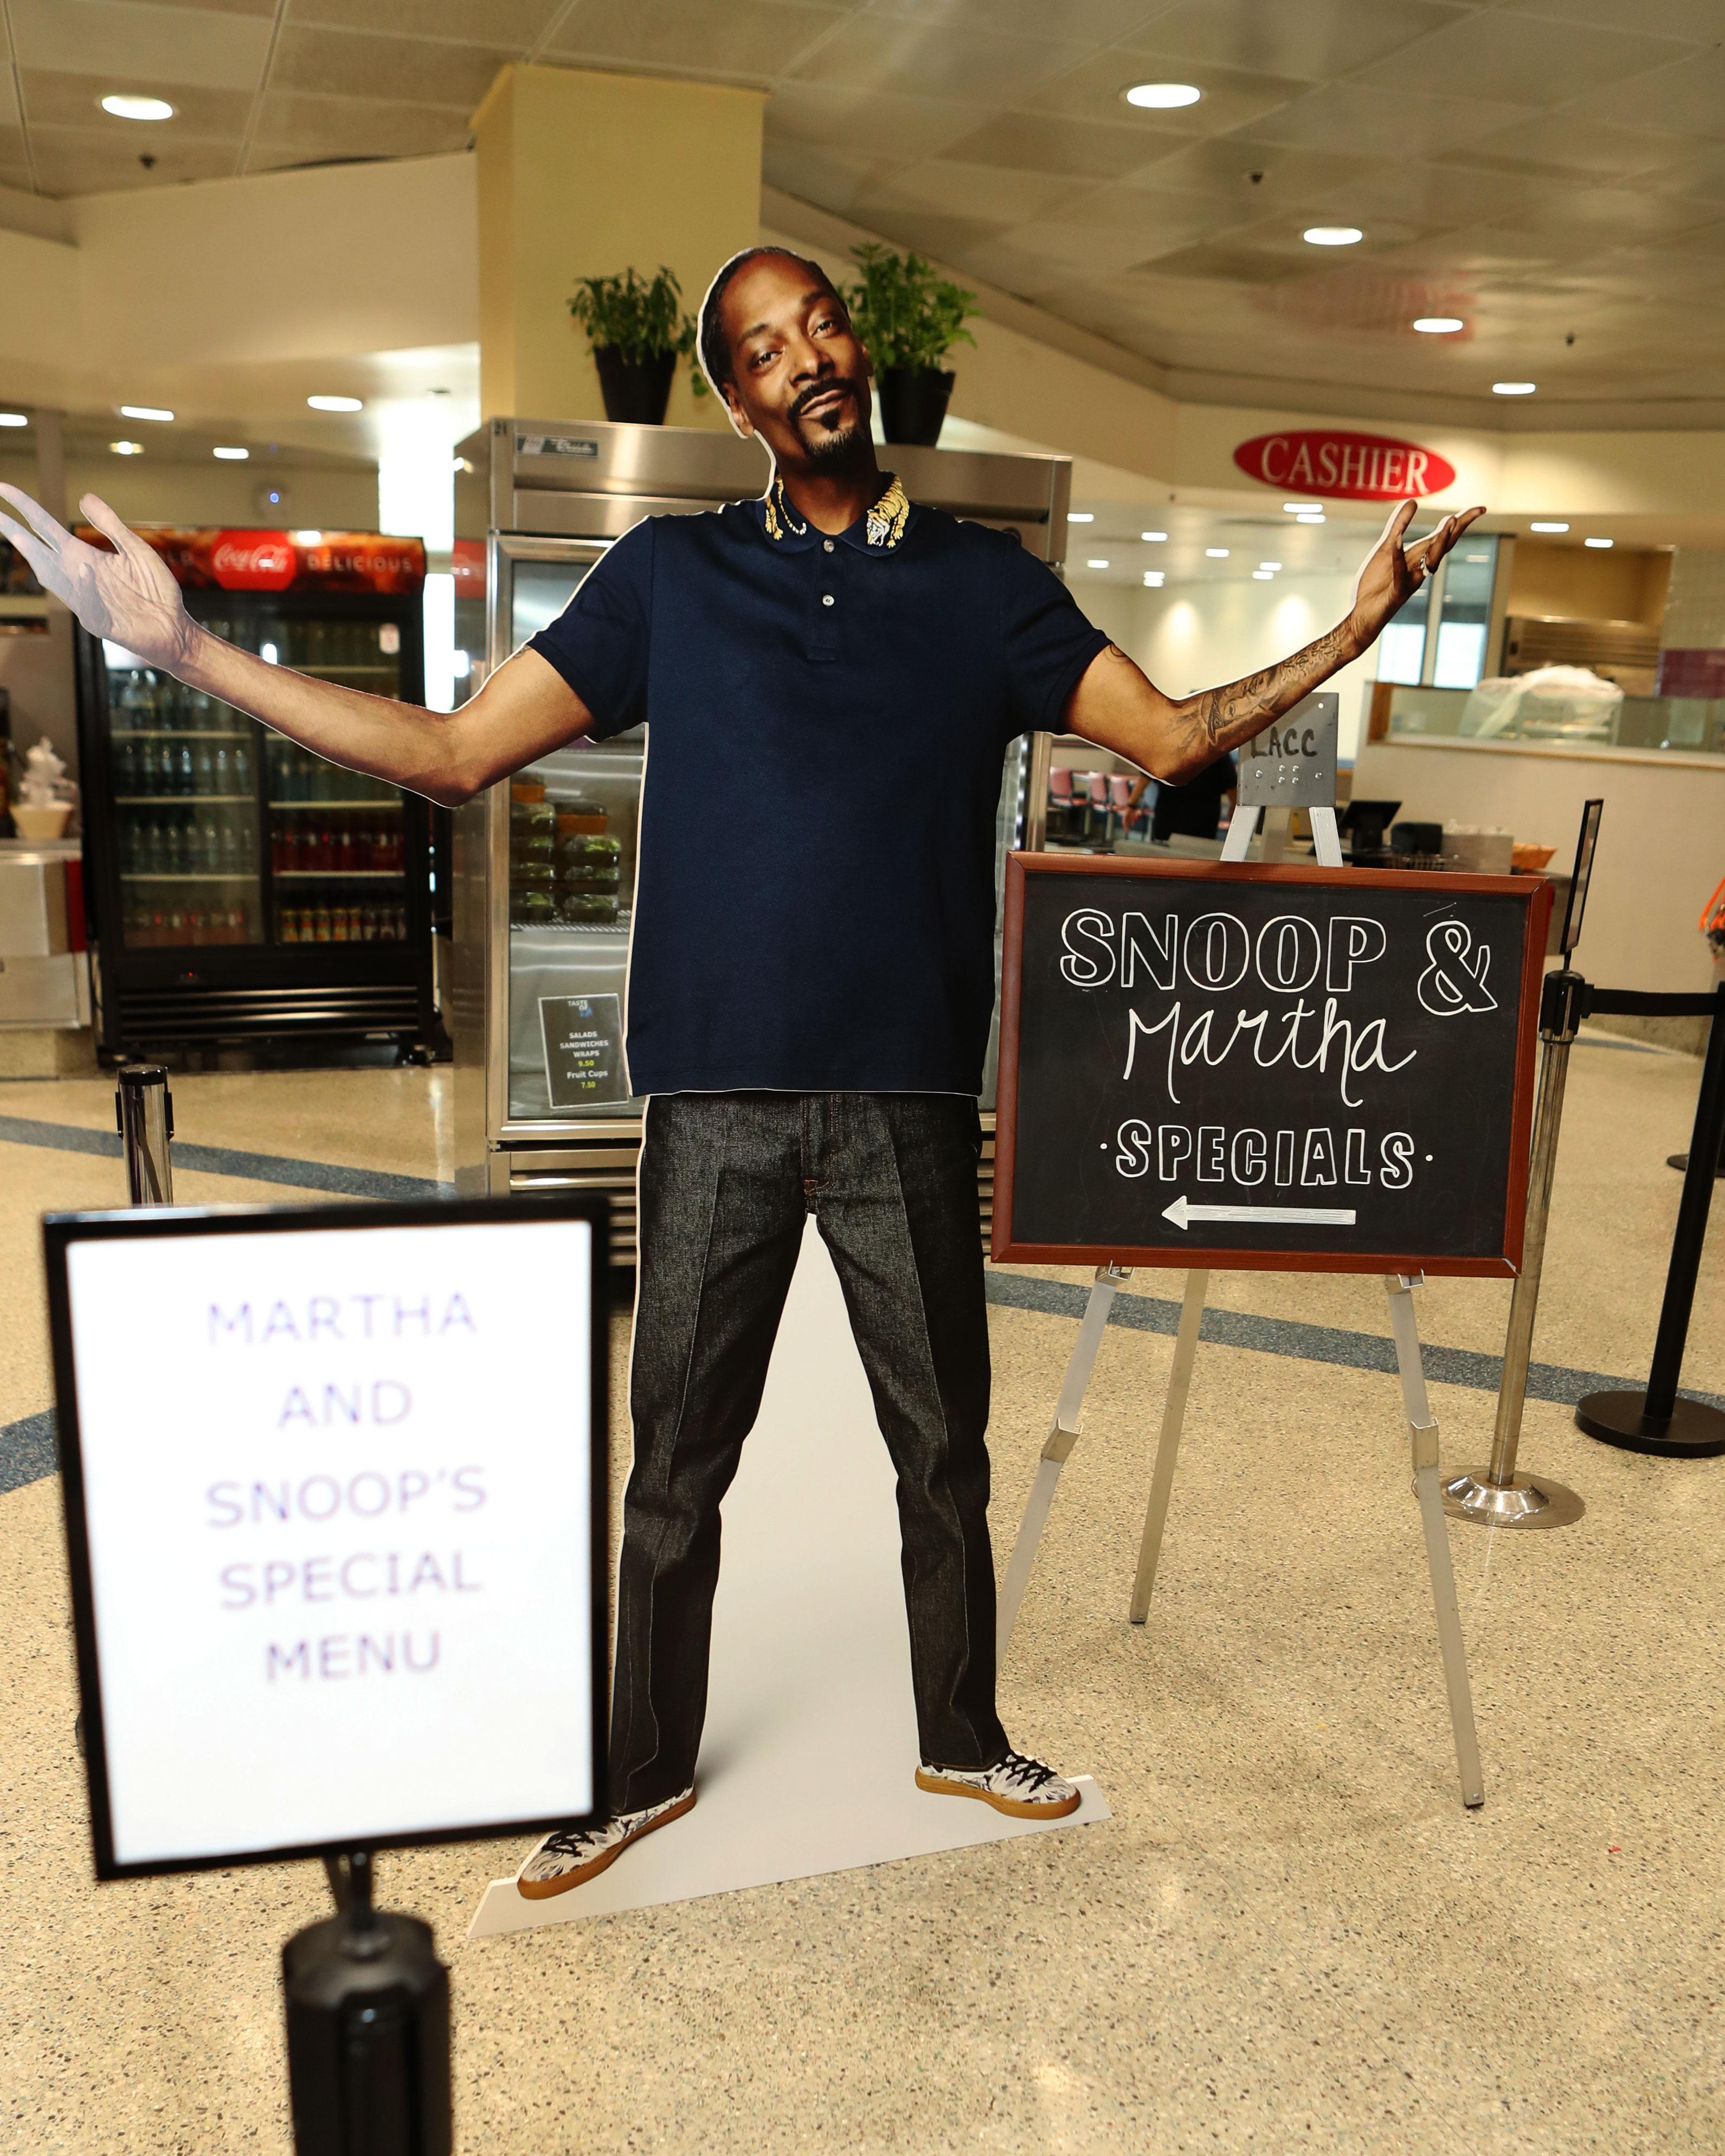 The Snoop Dogg and Martha Stewart Cookbook Does Not Disappoint The Snoop Dogg and Martha Stewart Cookbook Does Not Disappoint